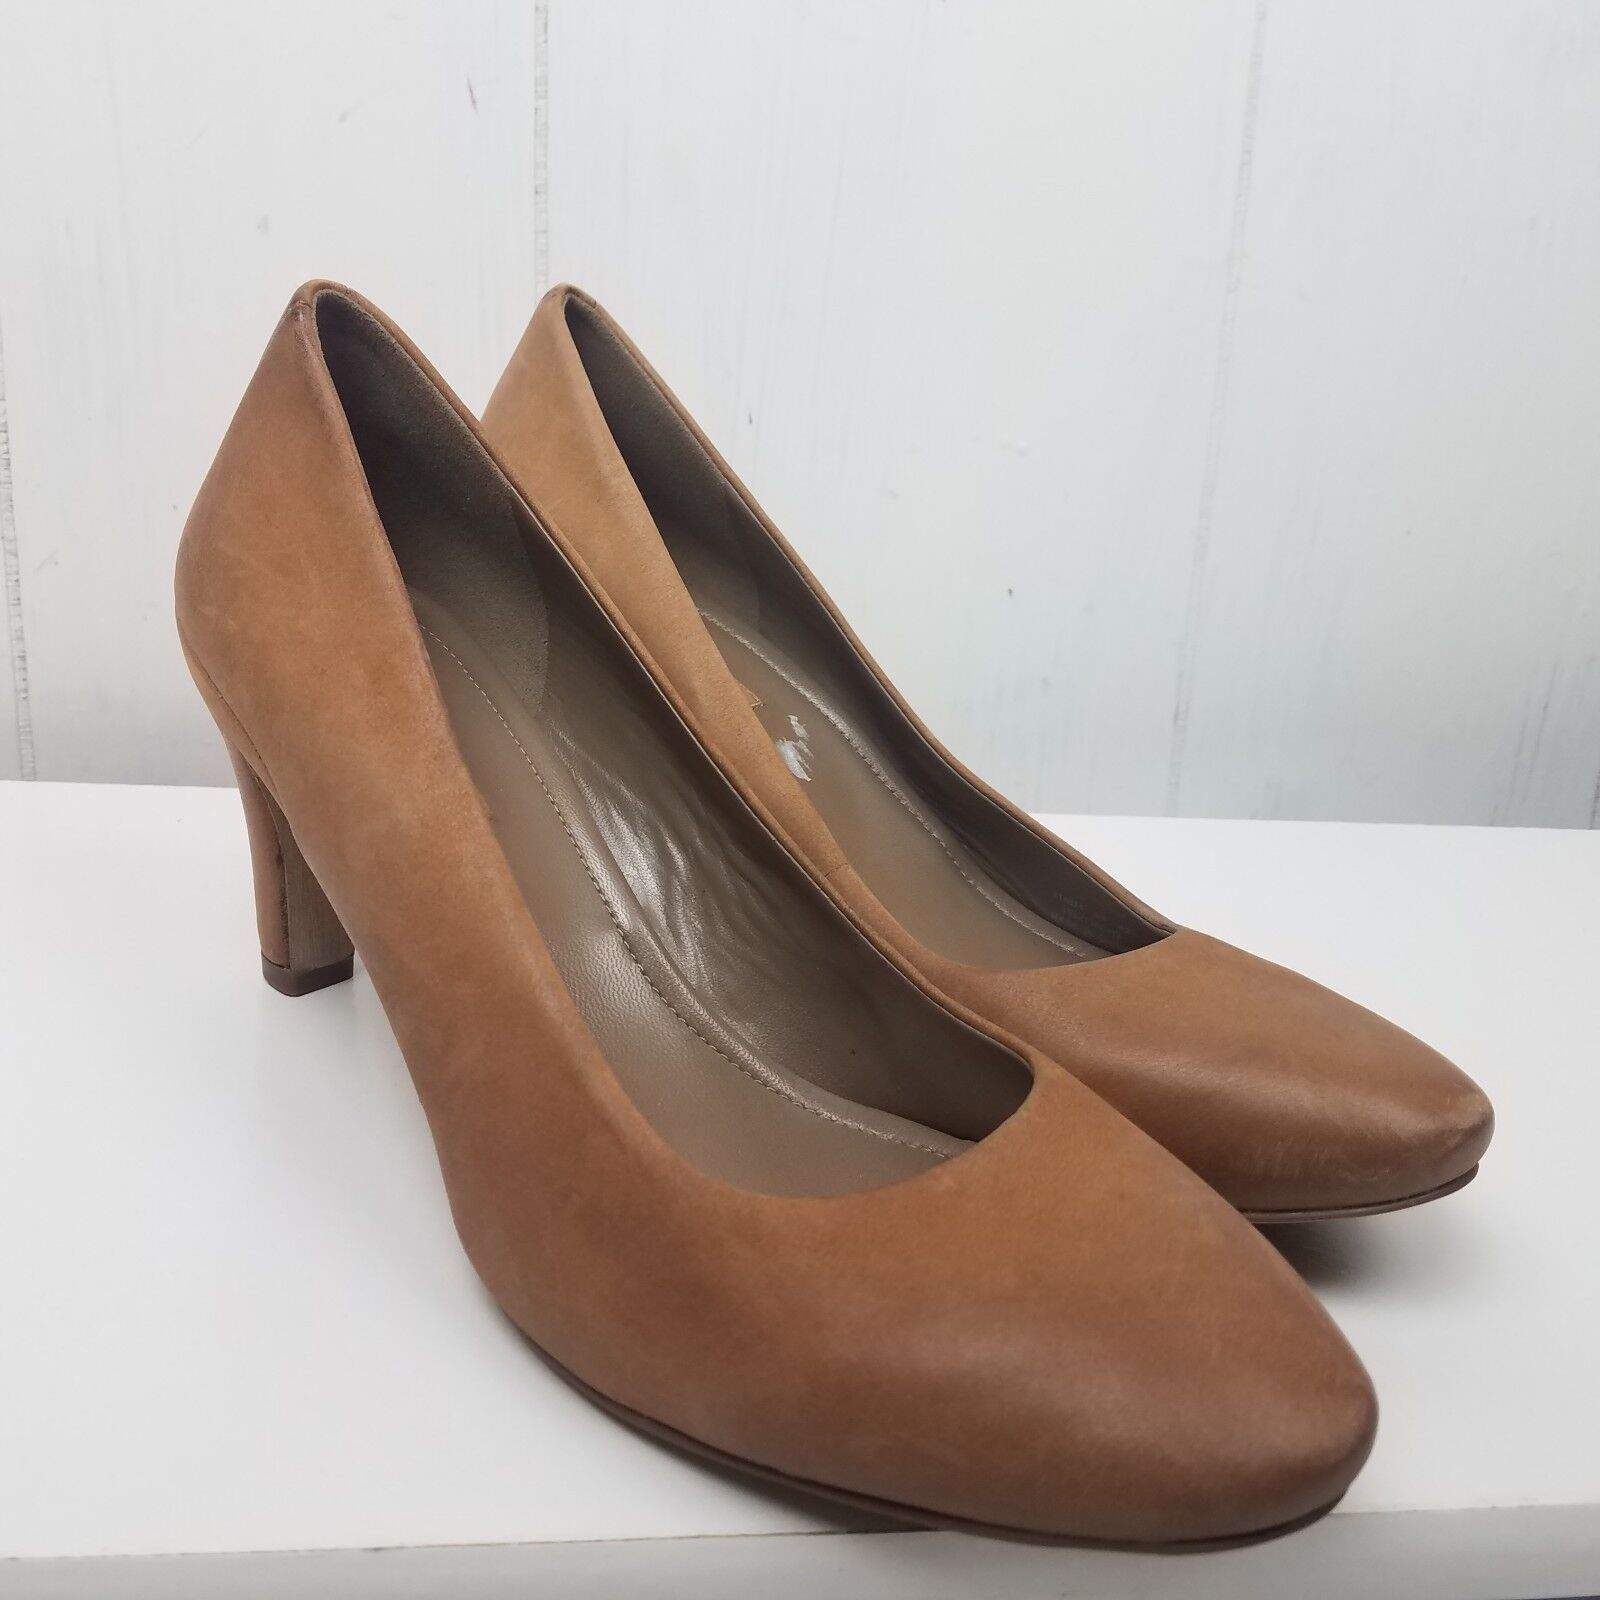 Ecco Sz 42 Tan Leather Pump Heels Round Toe Soft Comfort Womens 8 8.5 Classic